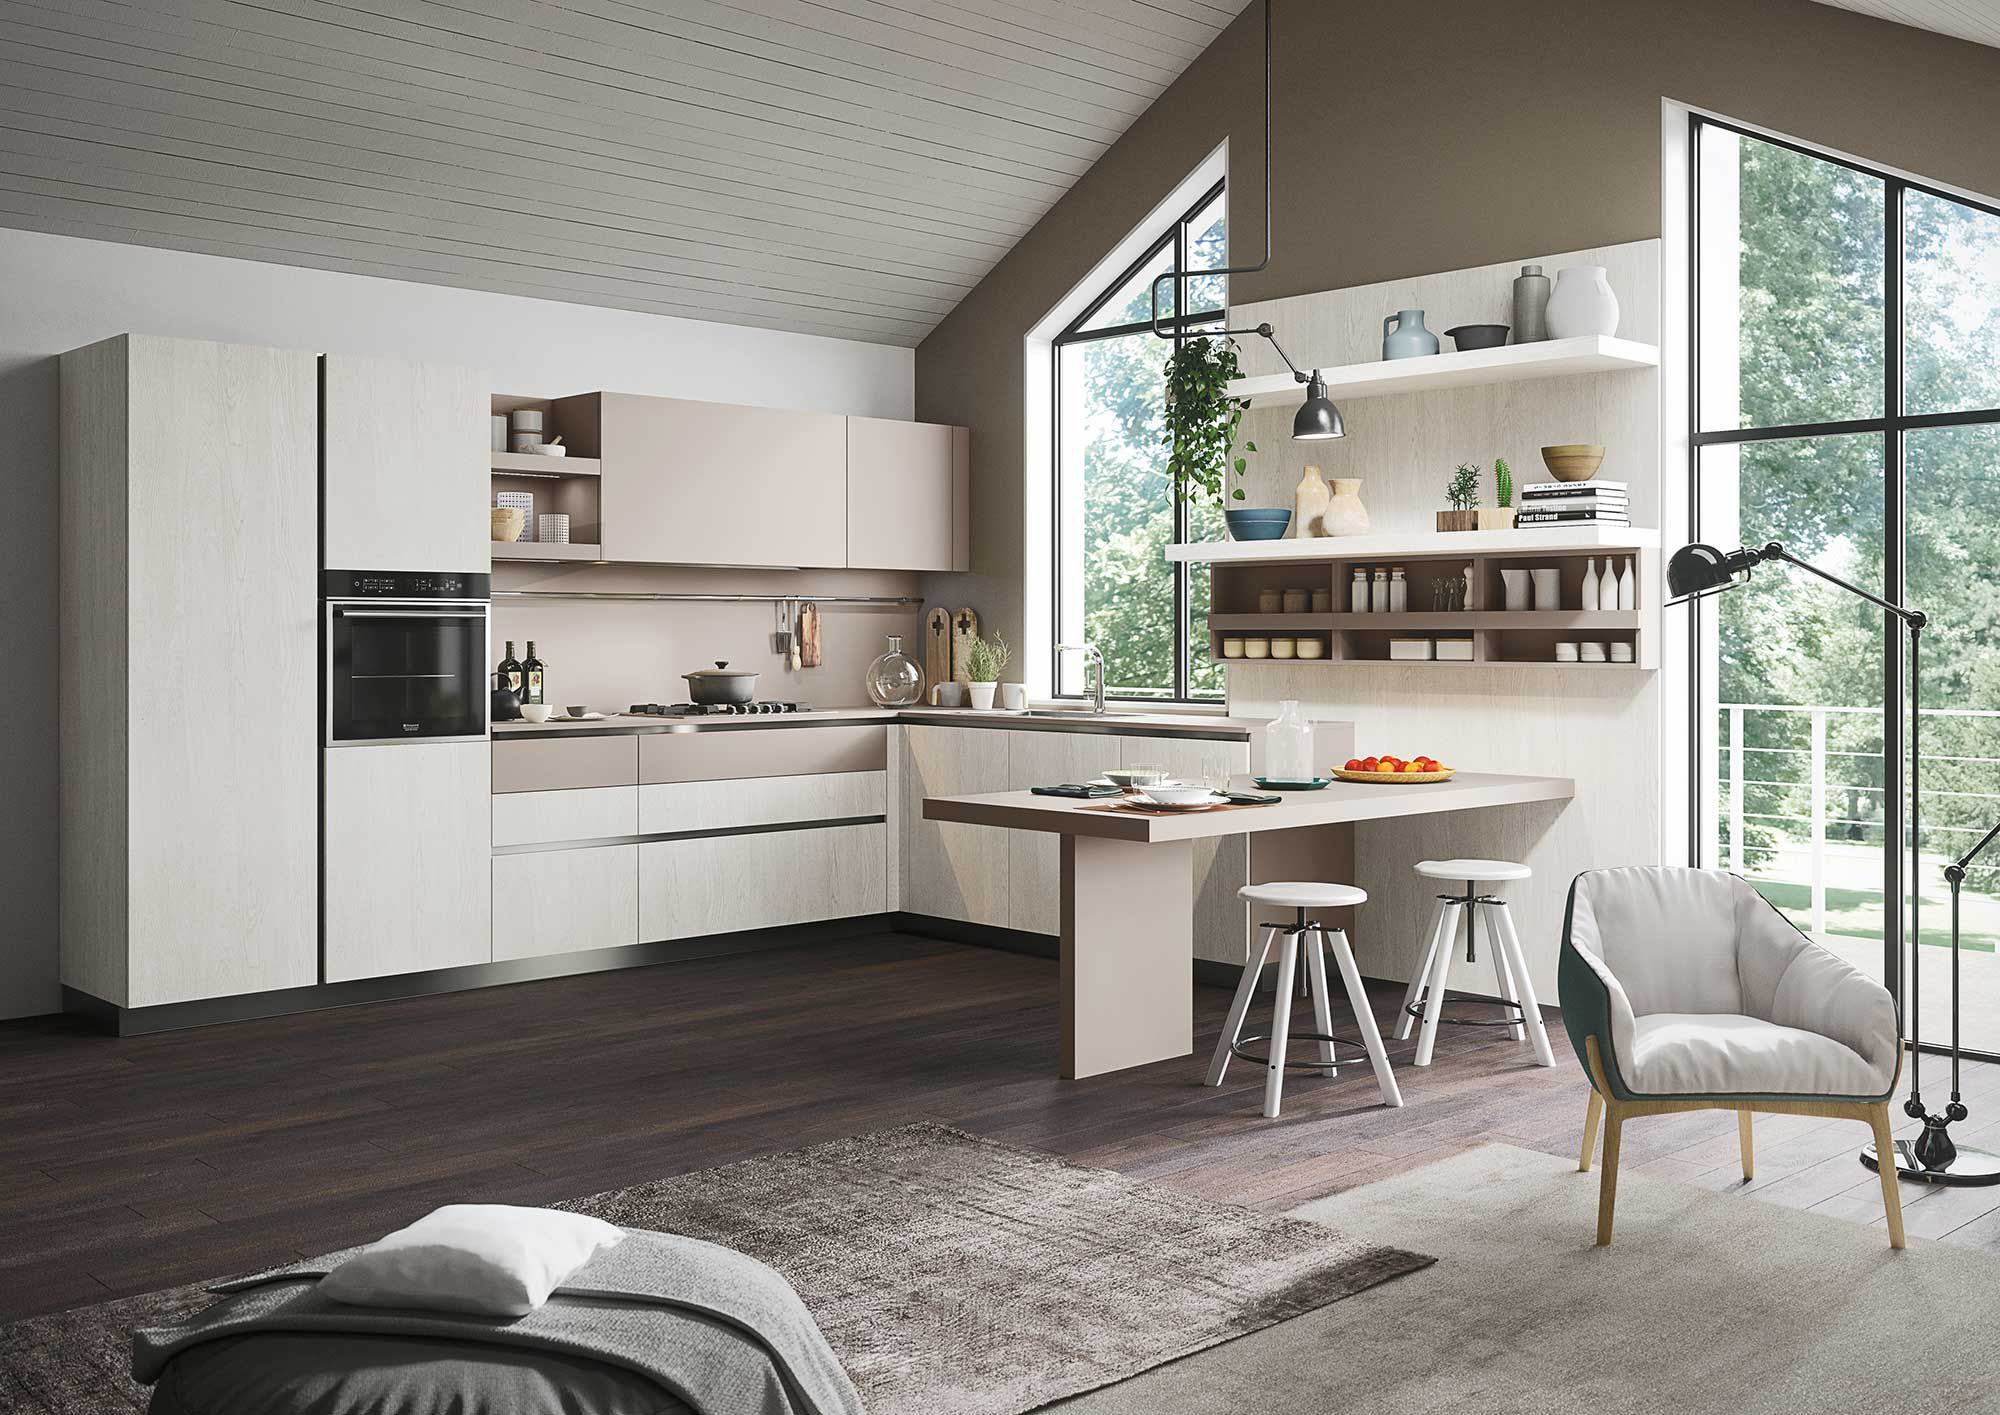 Cucina moderna / in legno / senza maniglie - FIRST - SNAIDERO RINO ...